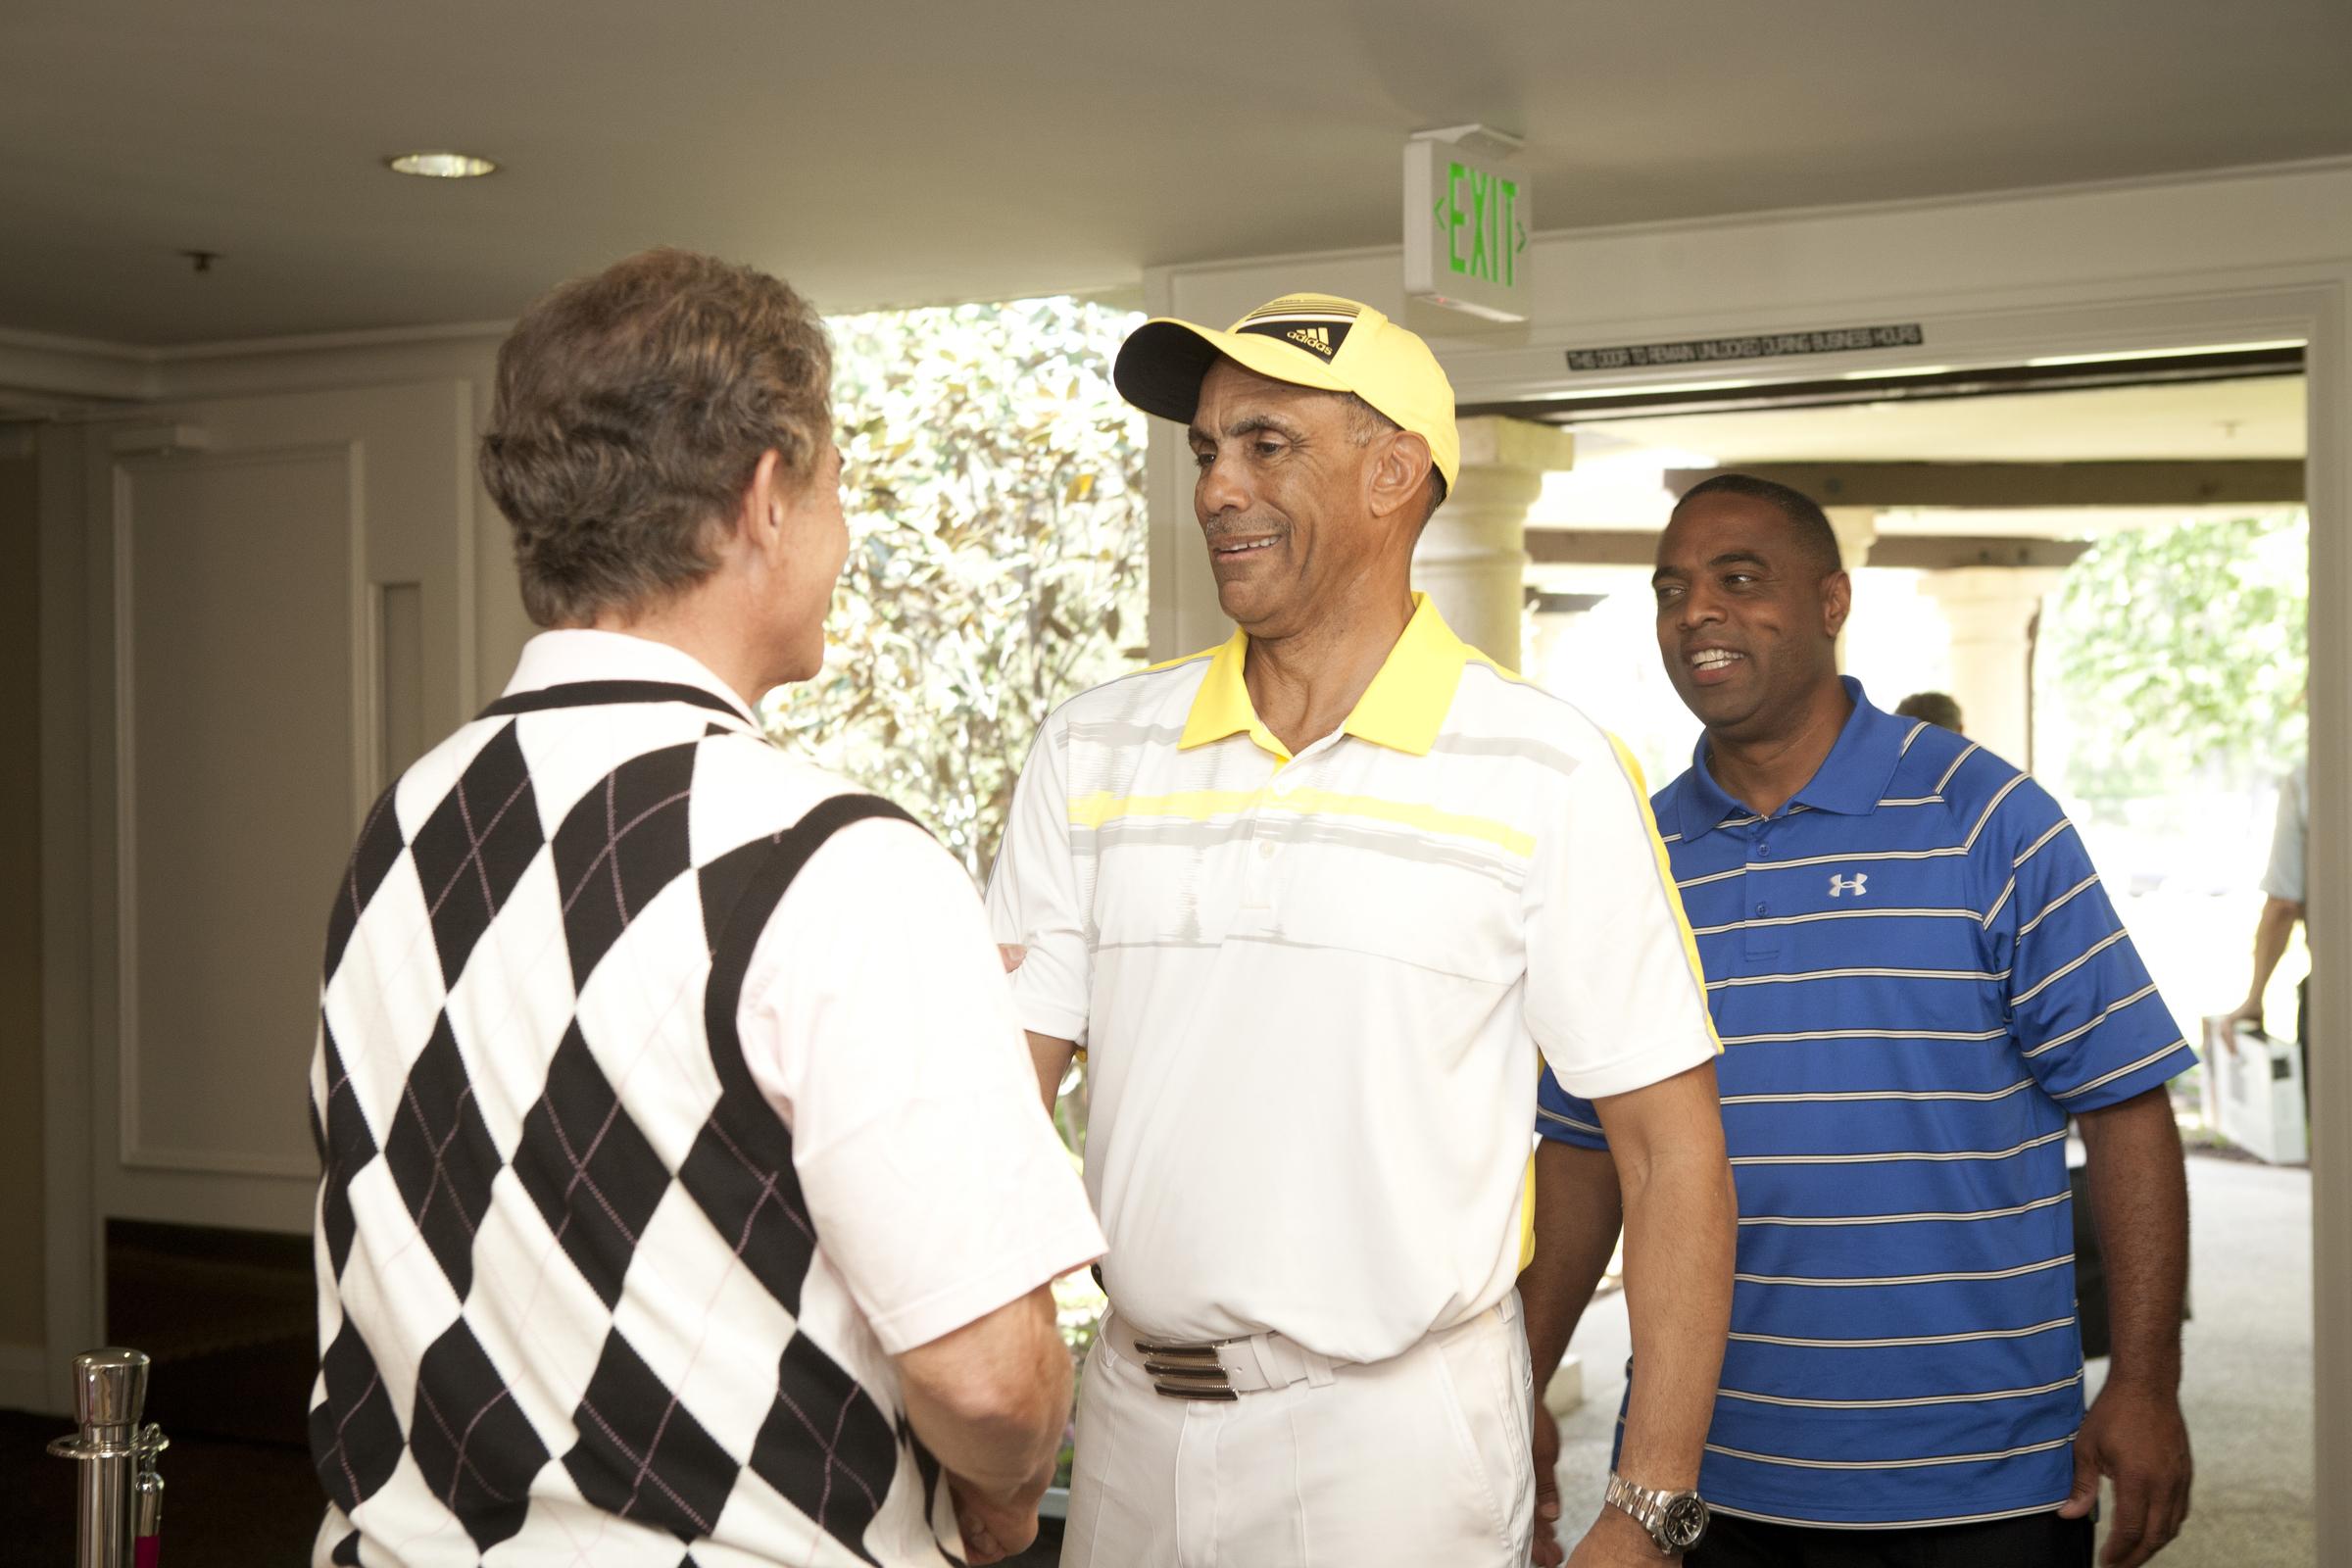 IMG_7416MSM_golf_event.JPG